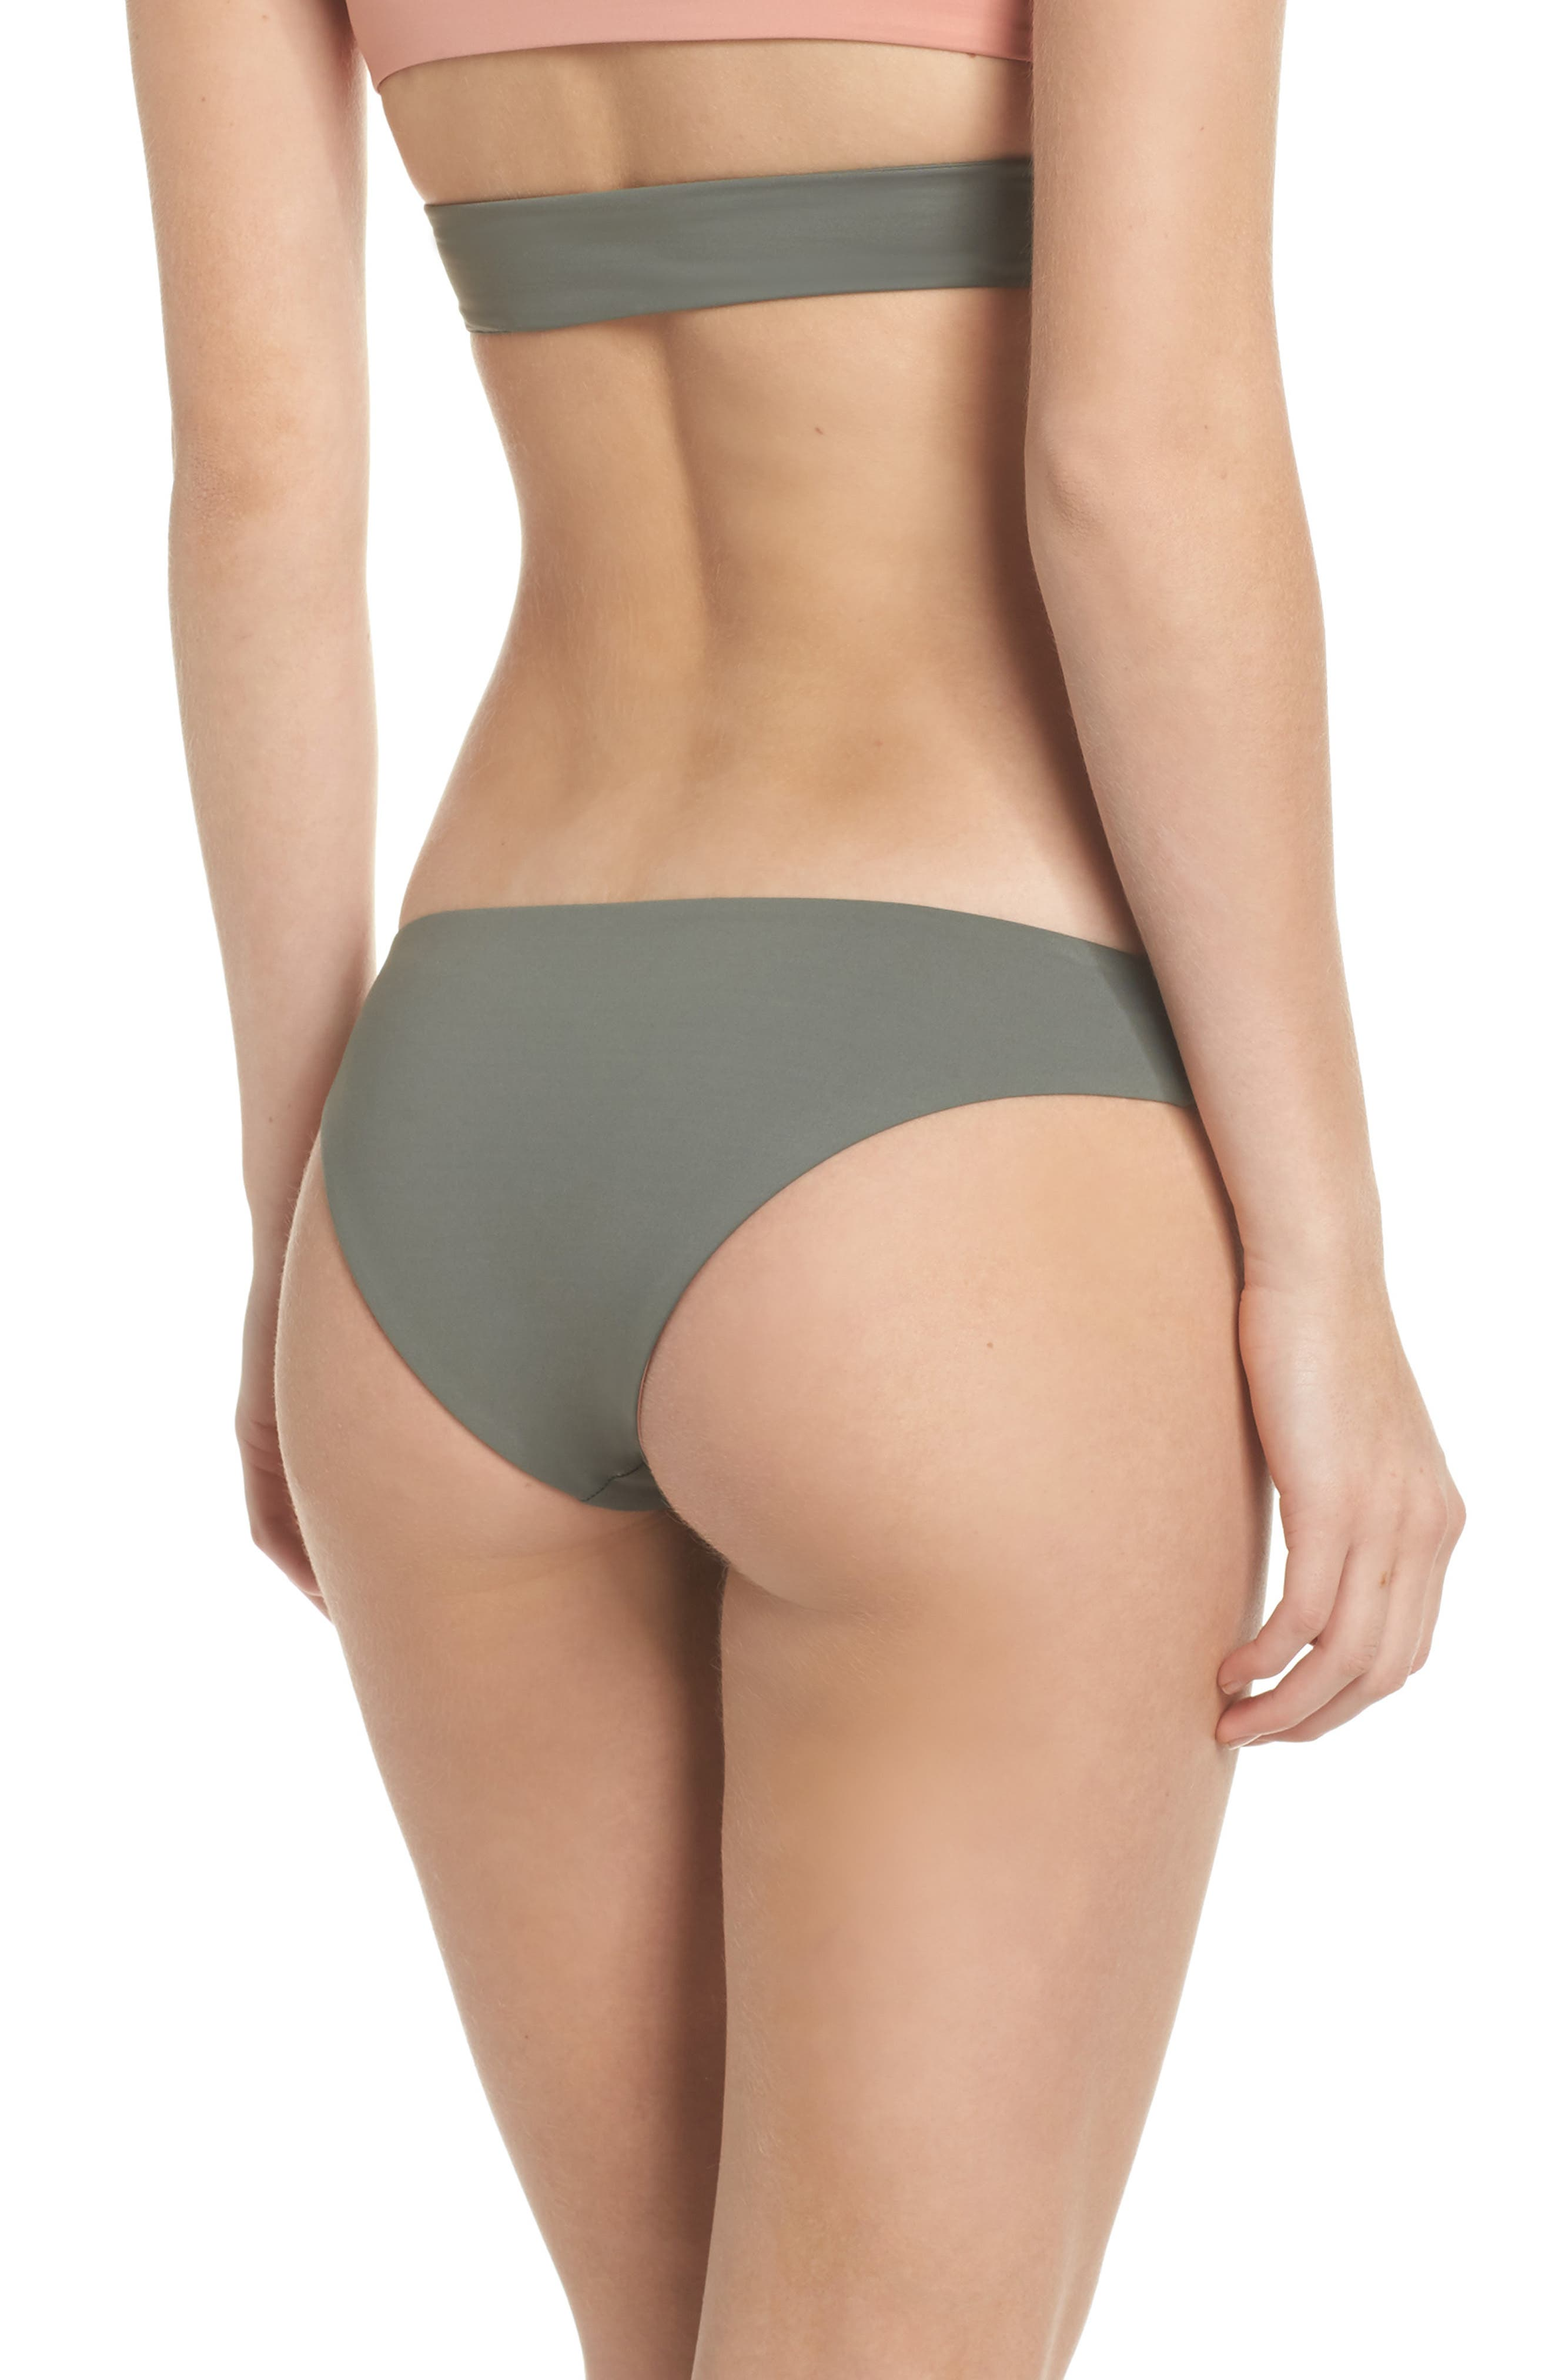 Jaclyn Hipster Bikini Bottoms,                             Alternate thumbnail 2, color,                             Desert Clay/ Cove Grey